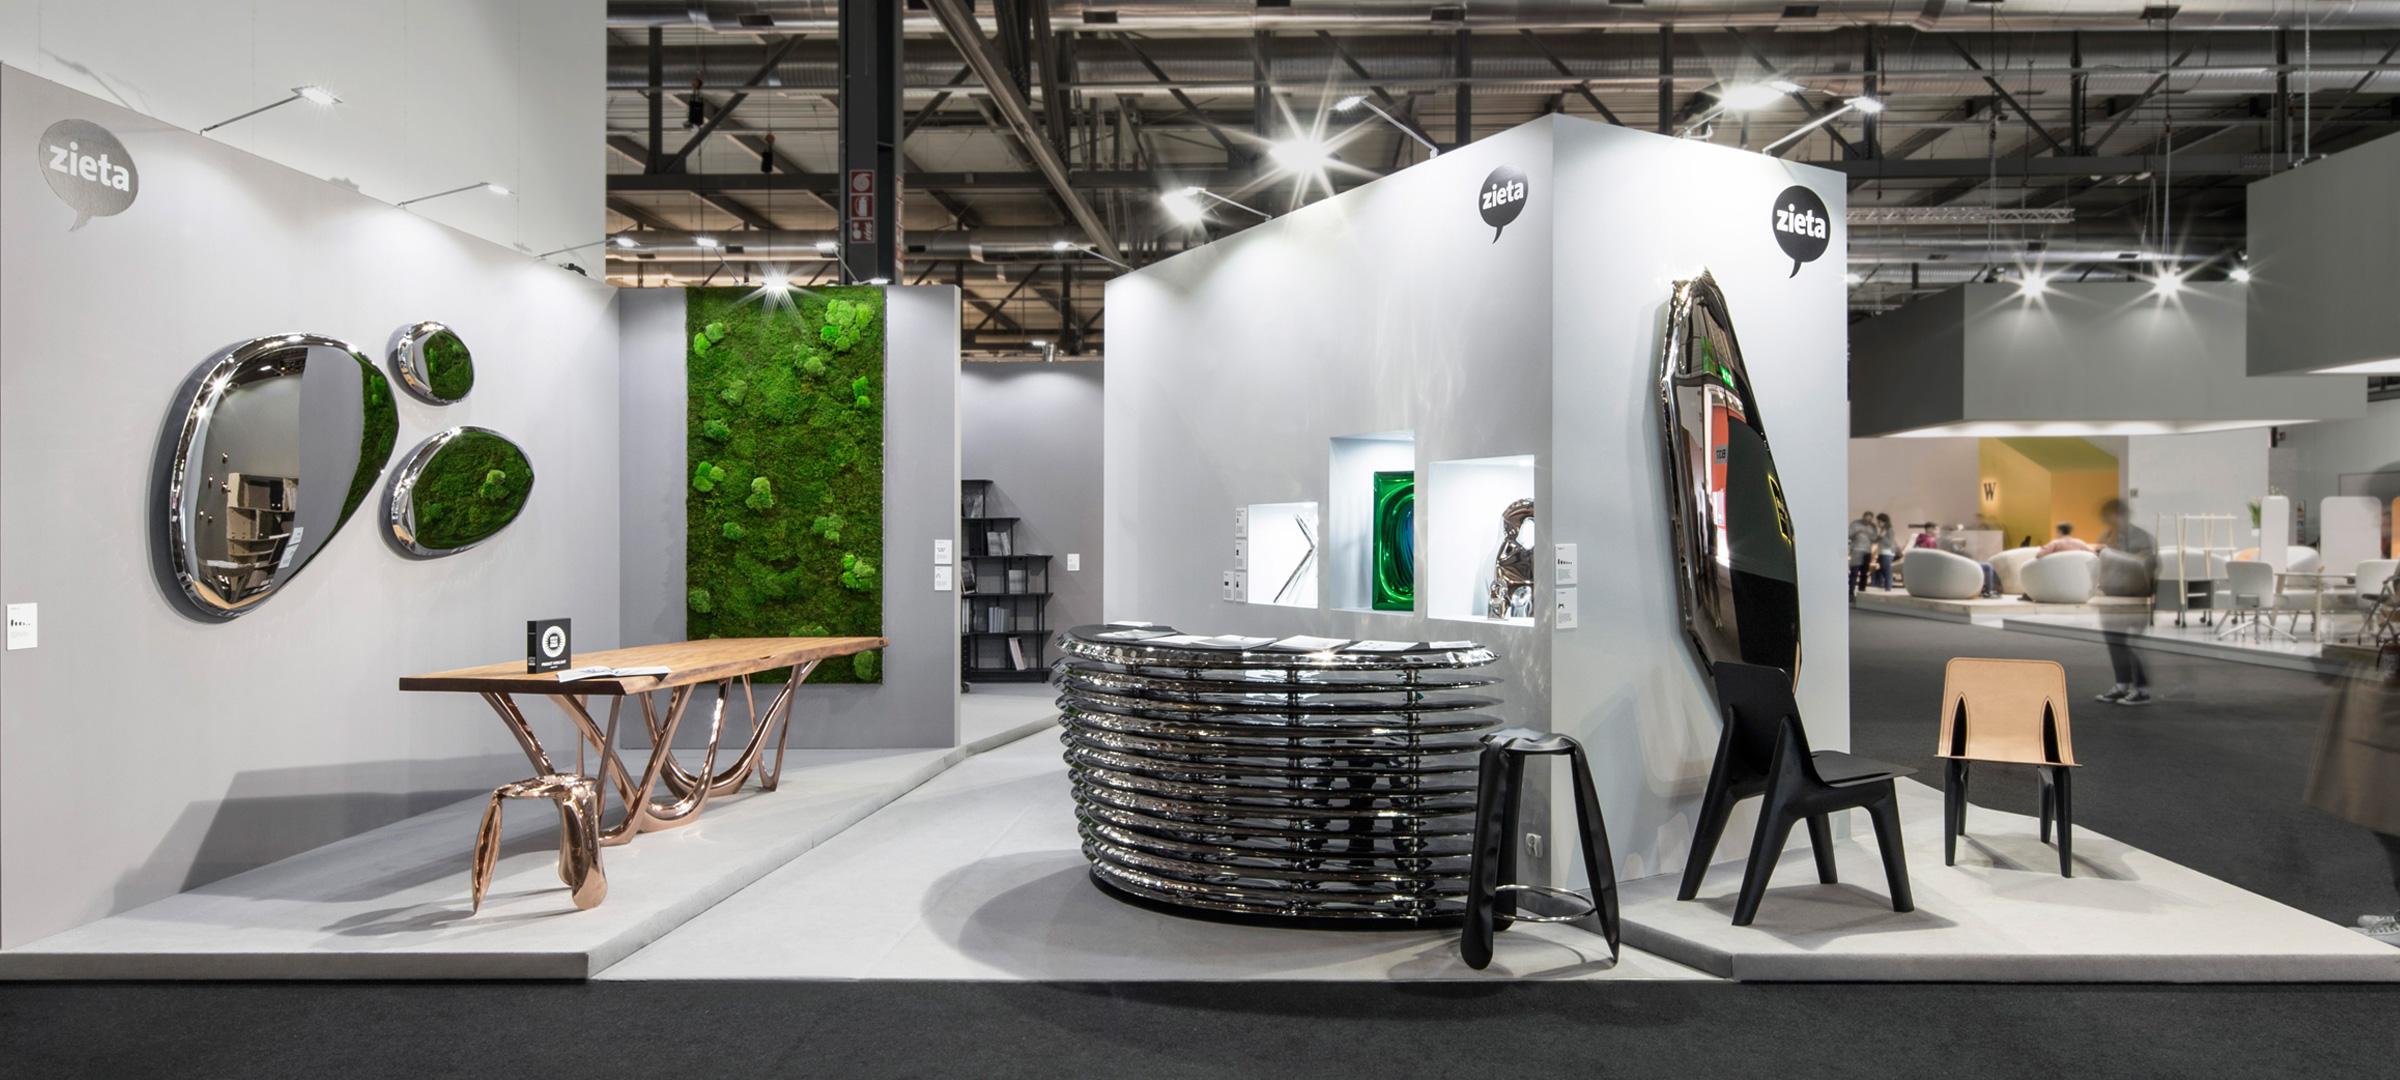 Zieta milan design week 2017 for Milan design week 2017